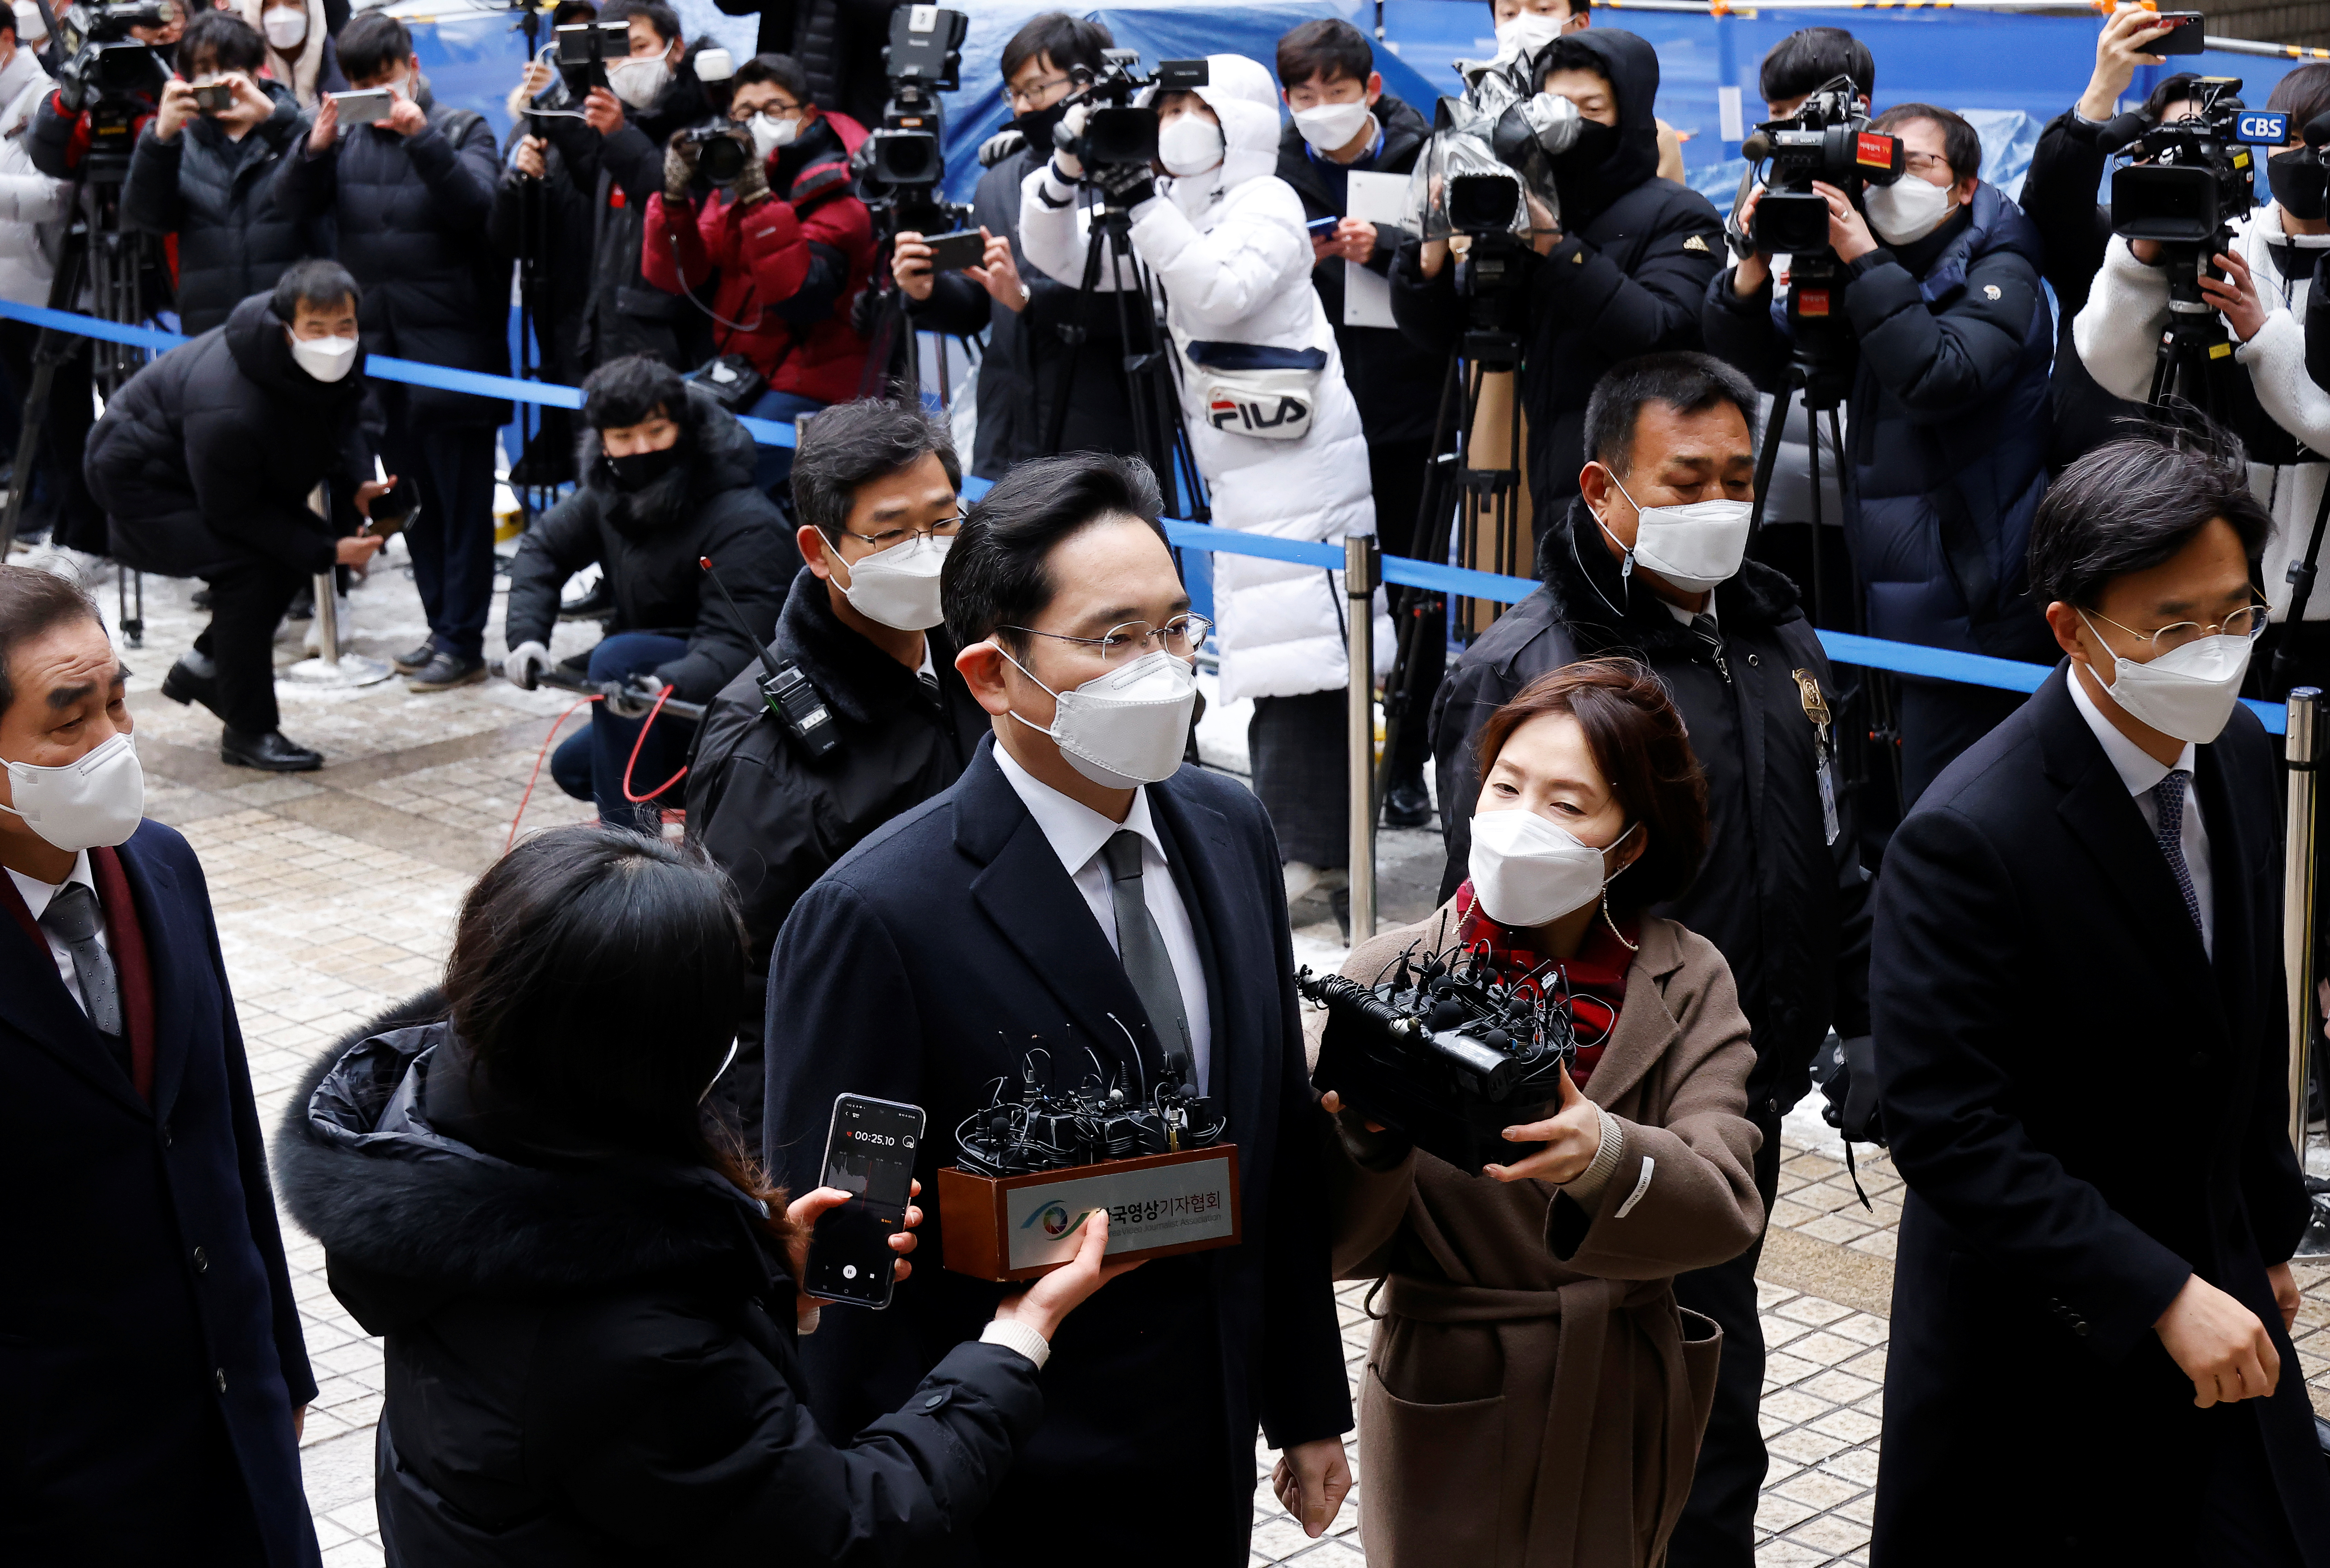 Samsung Group heir Jay Y. Lee arrives at a court in Seoul, South Korea, January 18, 2021. REUTERS/Kim Hong-Ji